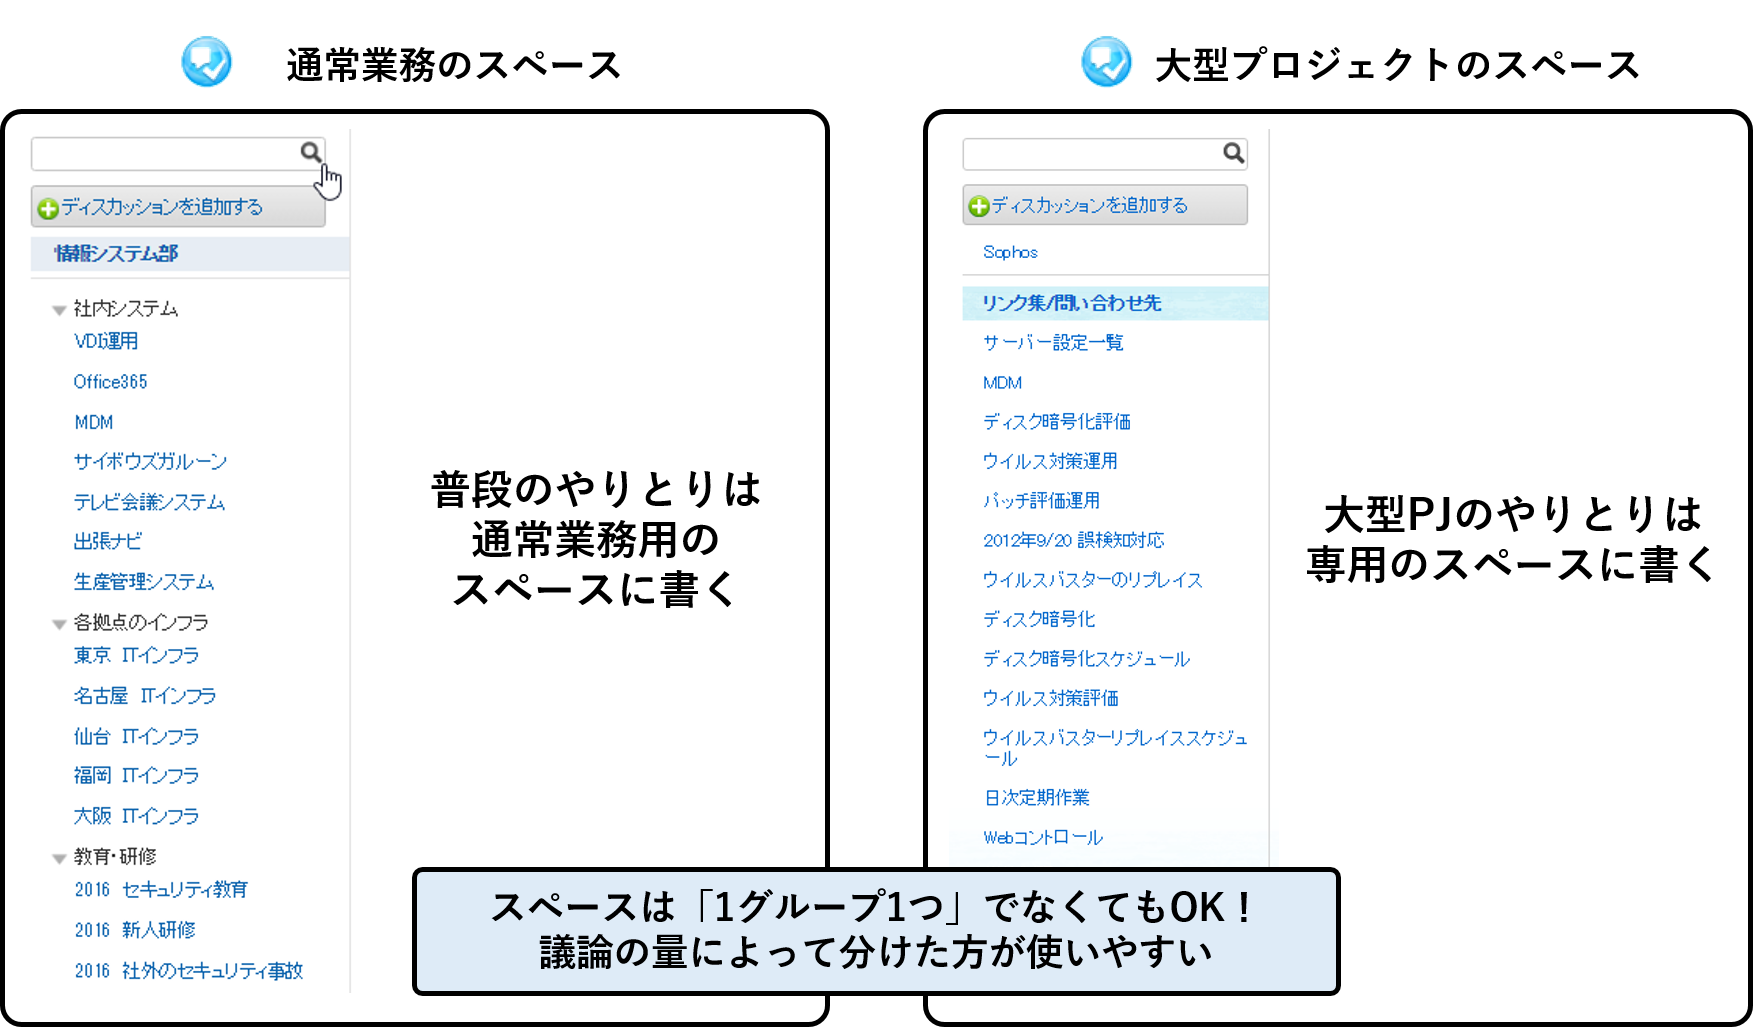 https://enterprise.cybozu.co.jp/f5ed65ac81e44b4a65cf75cfbe44465bcf6eed31.png